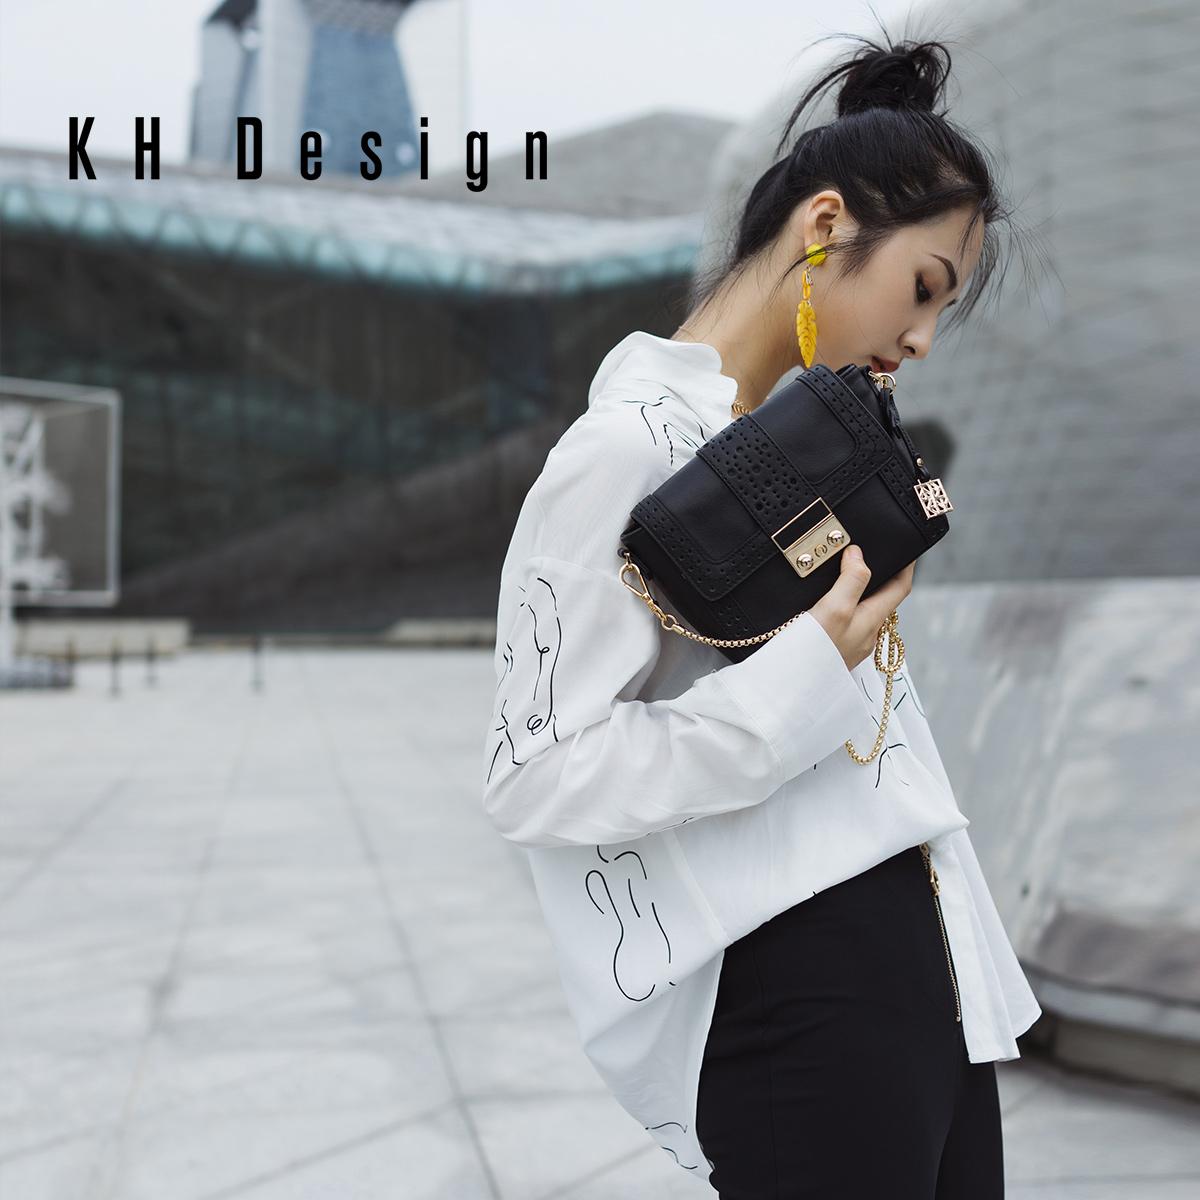 KH Design 明治 女包真皮小方包2019